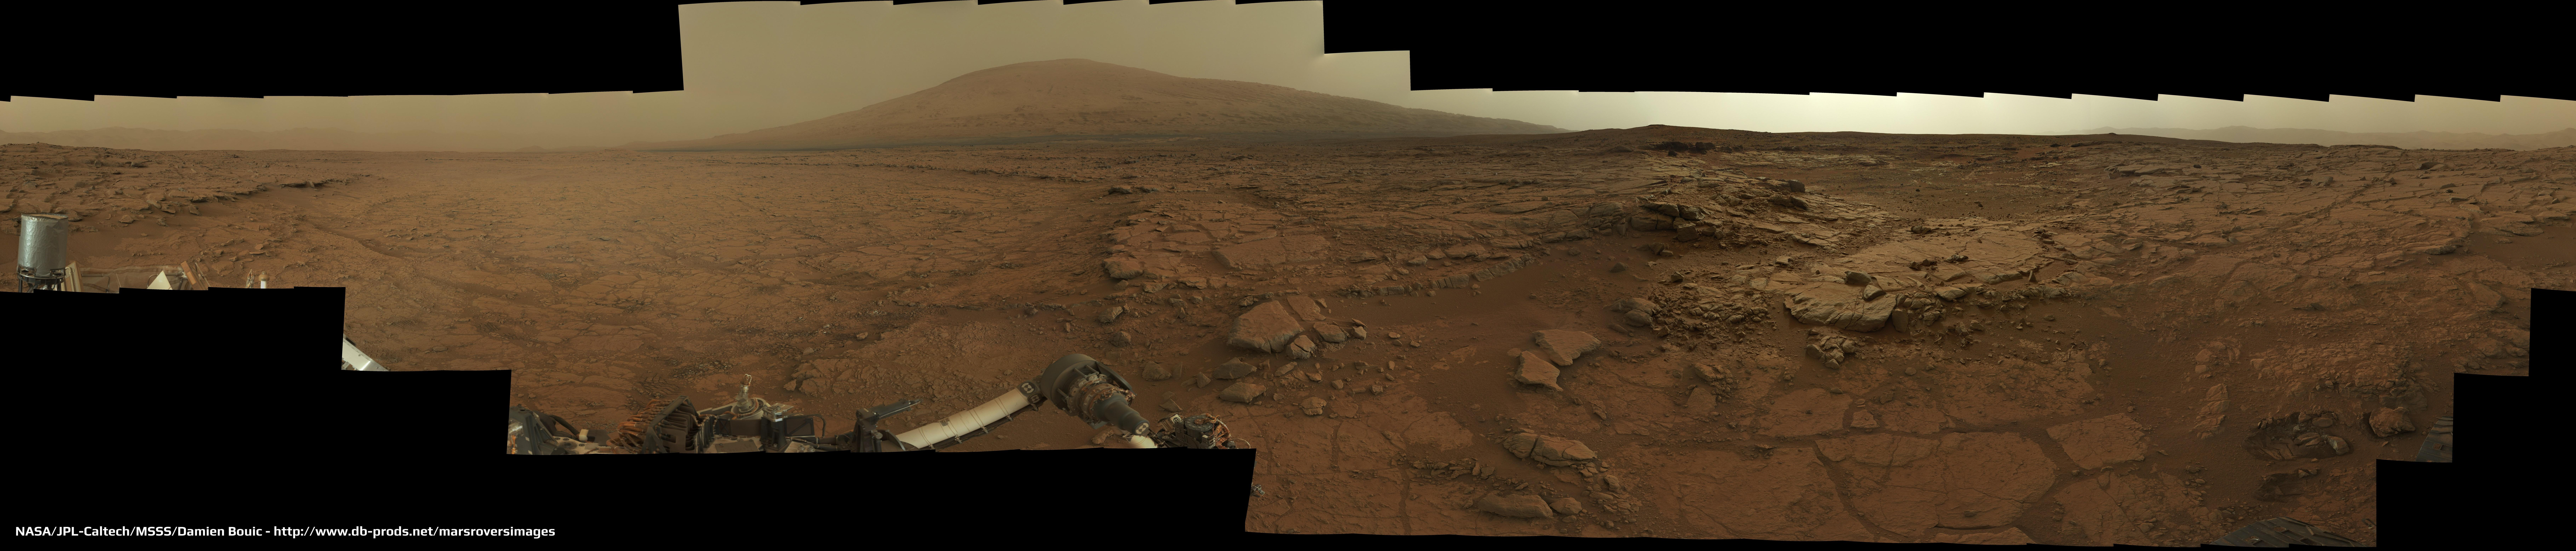 mars landing tonight - photo #9